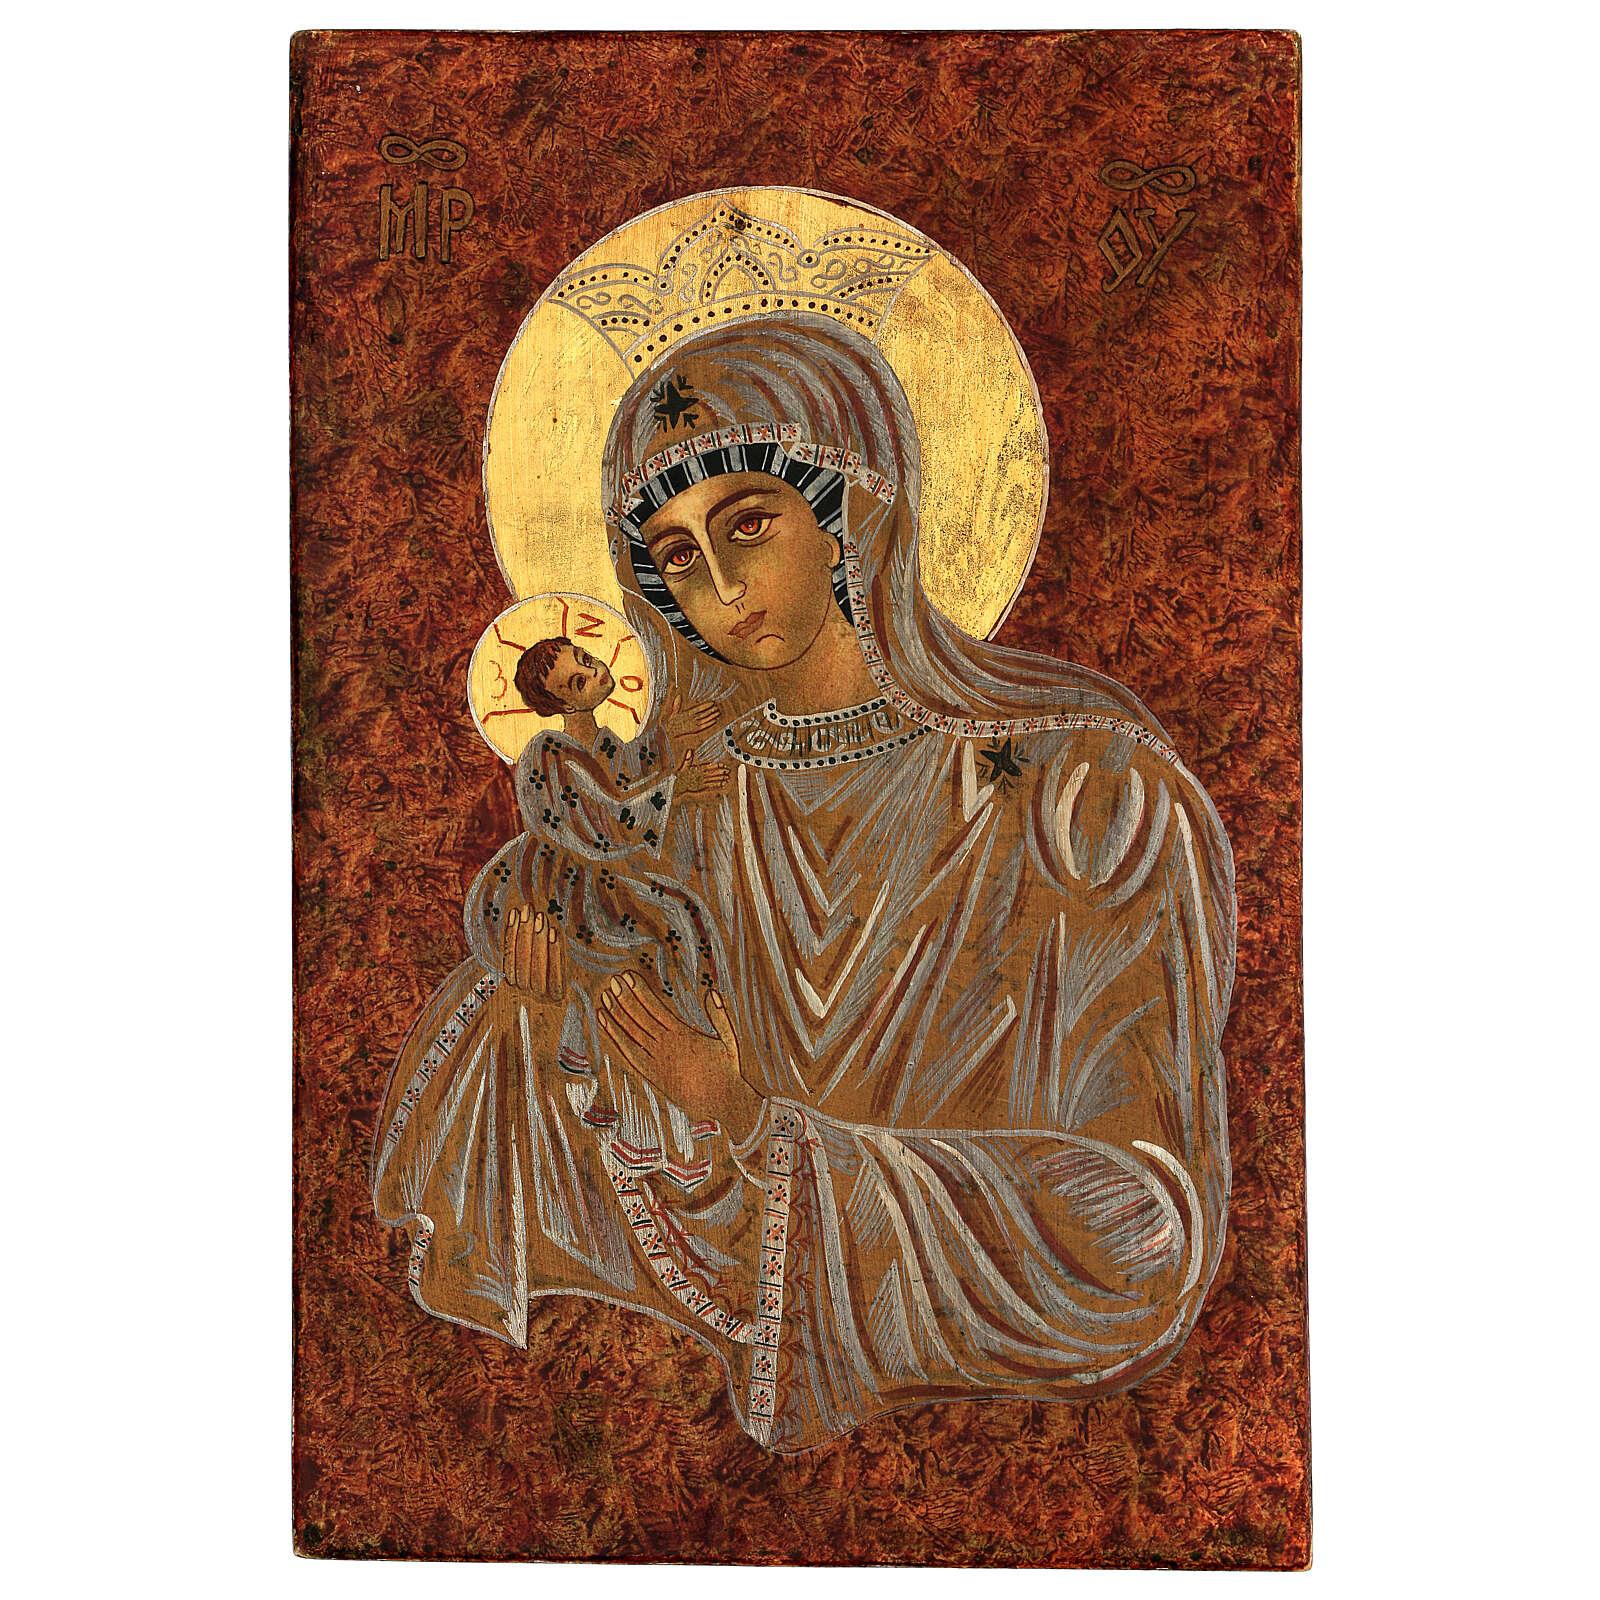 Icône Mère de Dieu Muromskaya Roumanie peinte à la main 30x20 cm 4